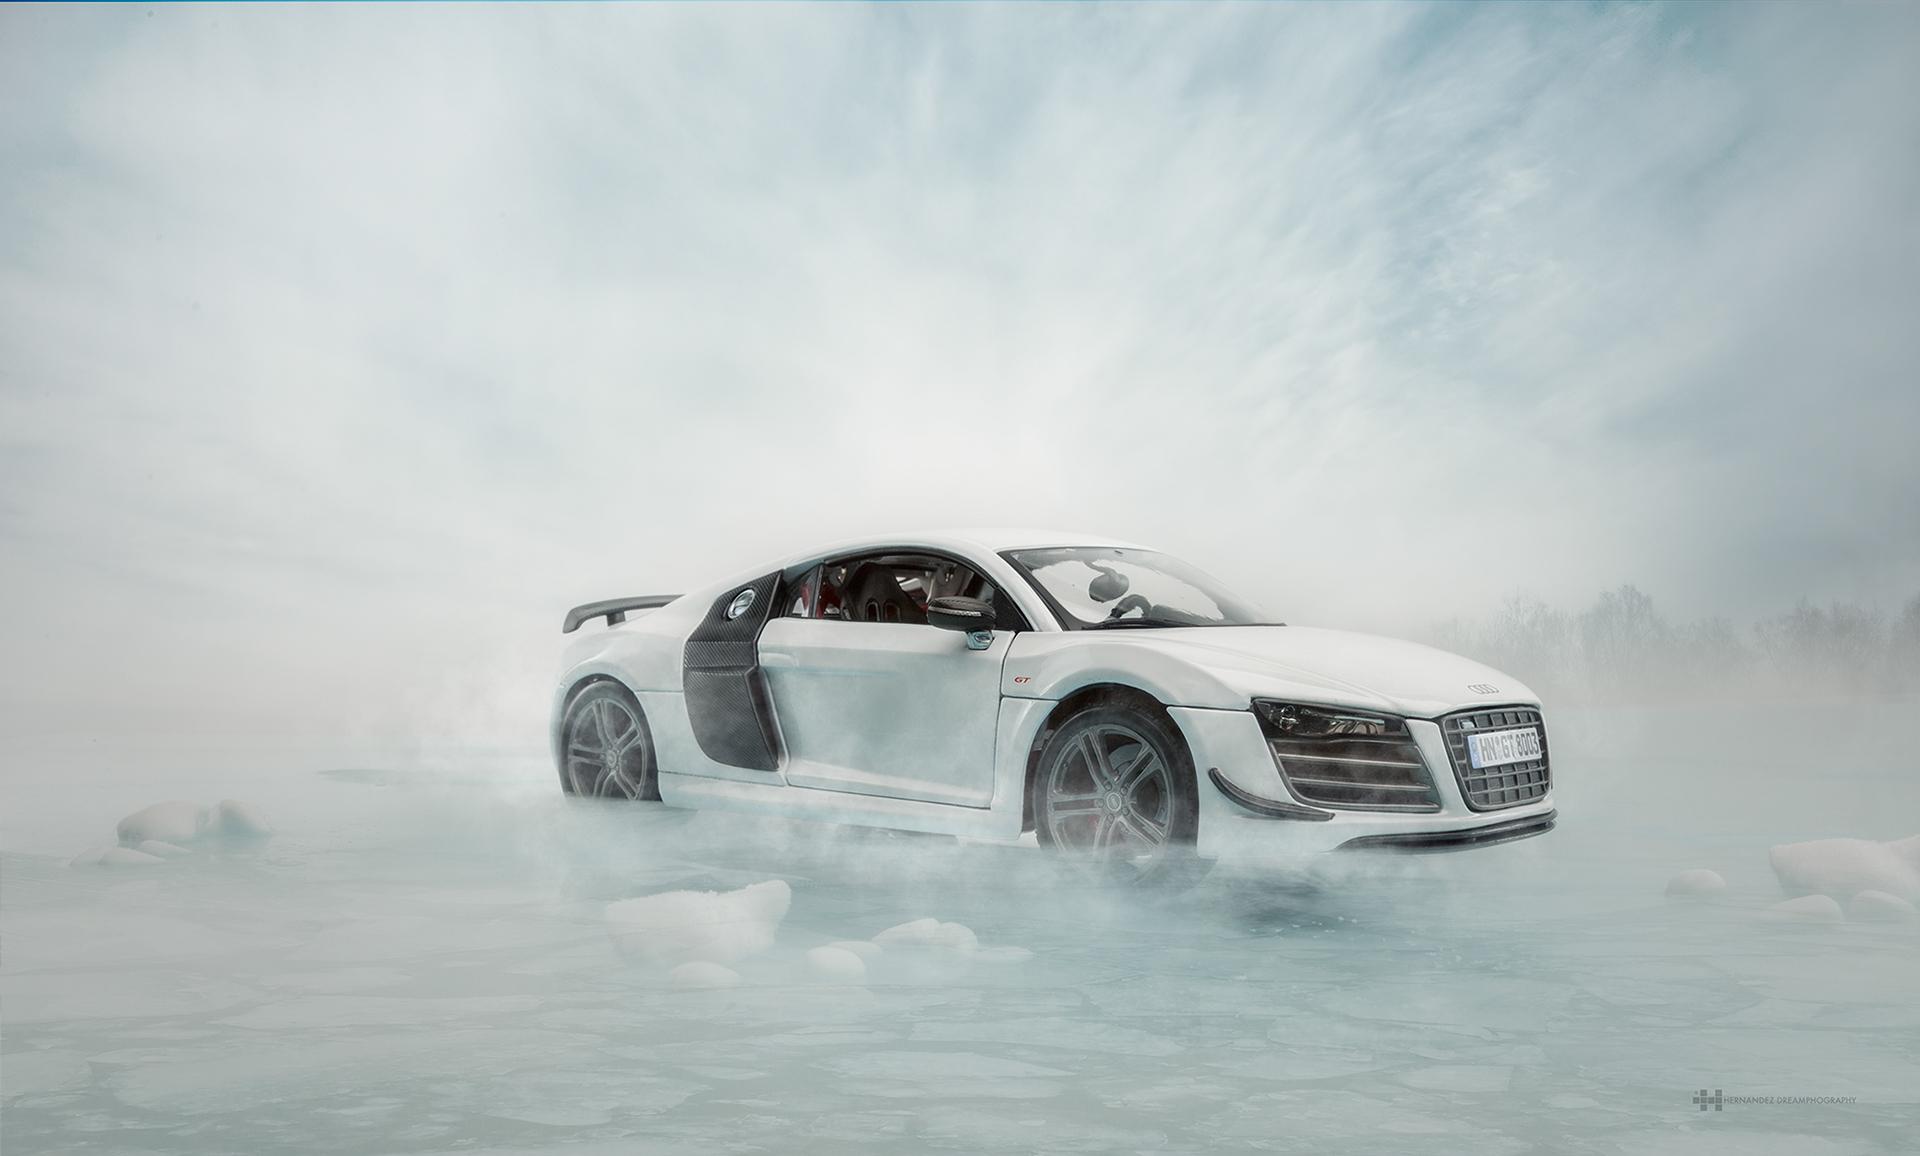 Audi R8 - Miniature Scale Model Car Photography (7)